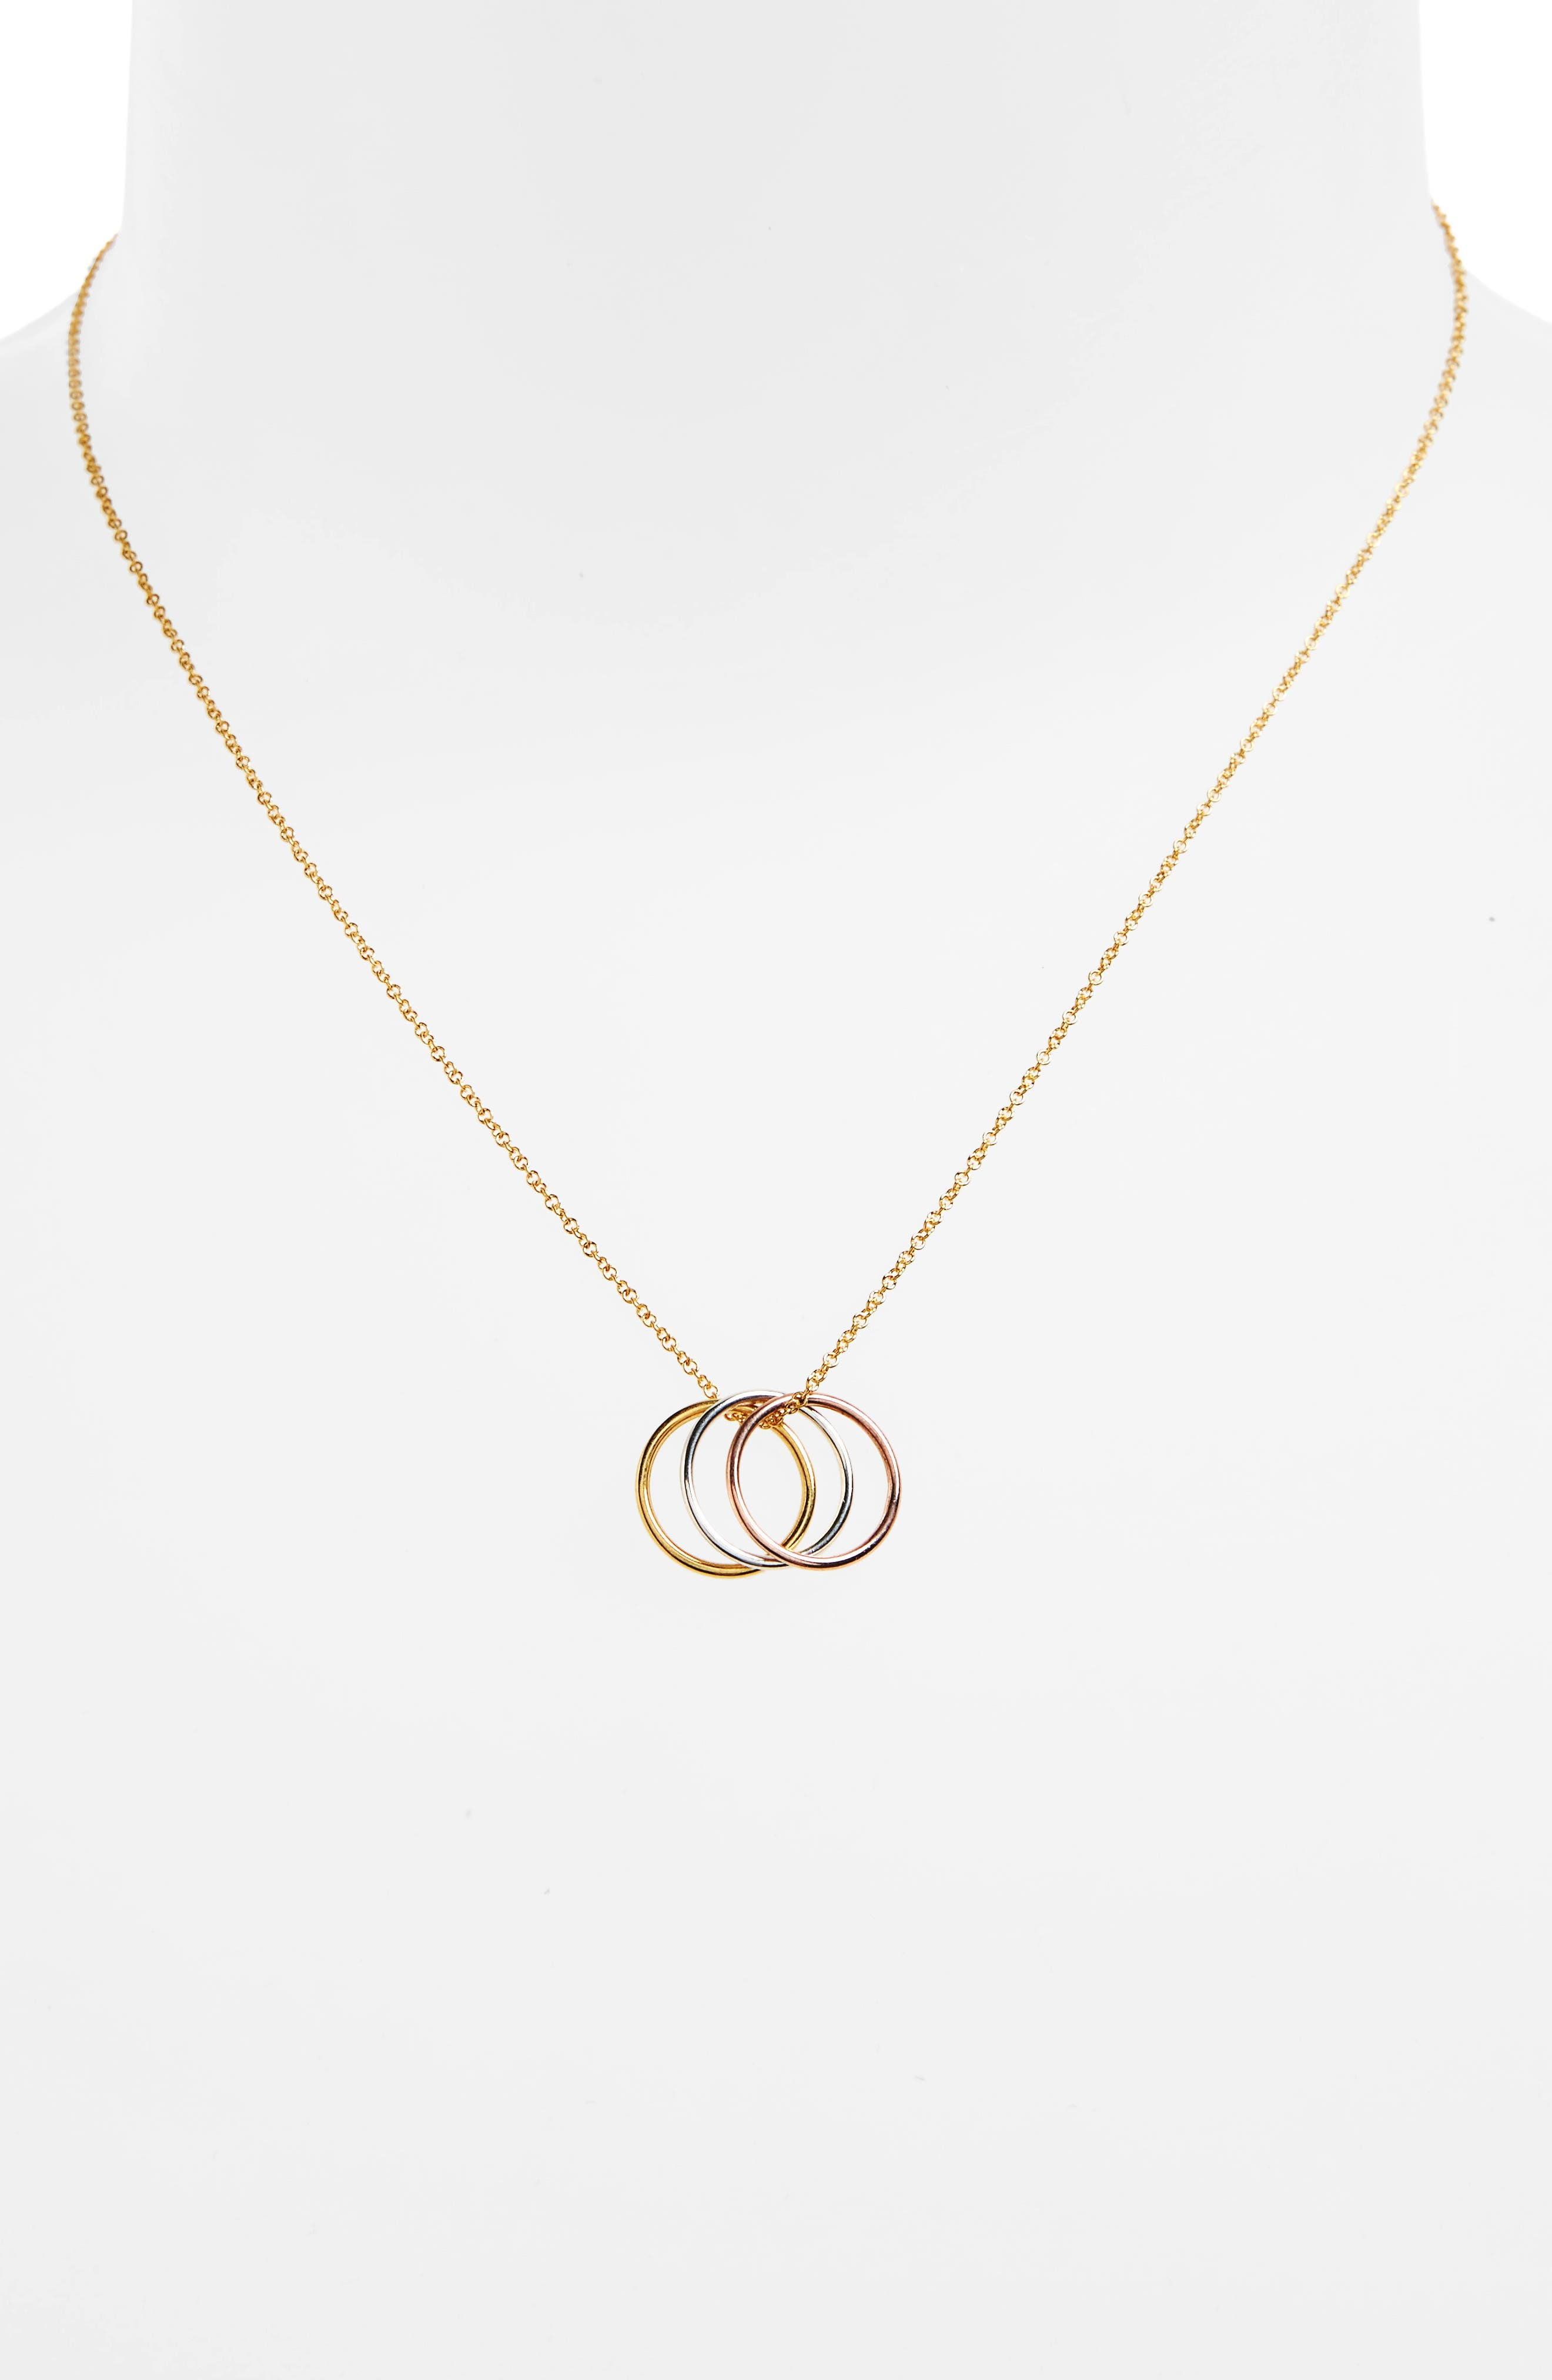 Triple Karma Pendant Necklace,                             Alternate thumbnail 2, color,                             711